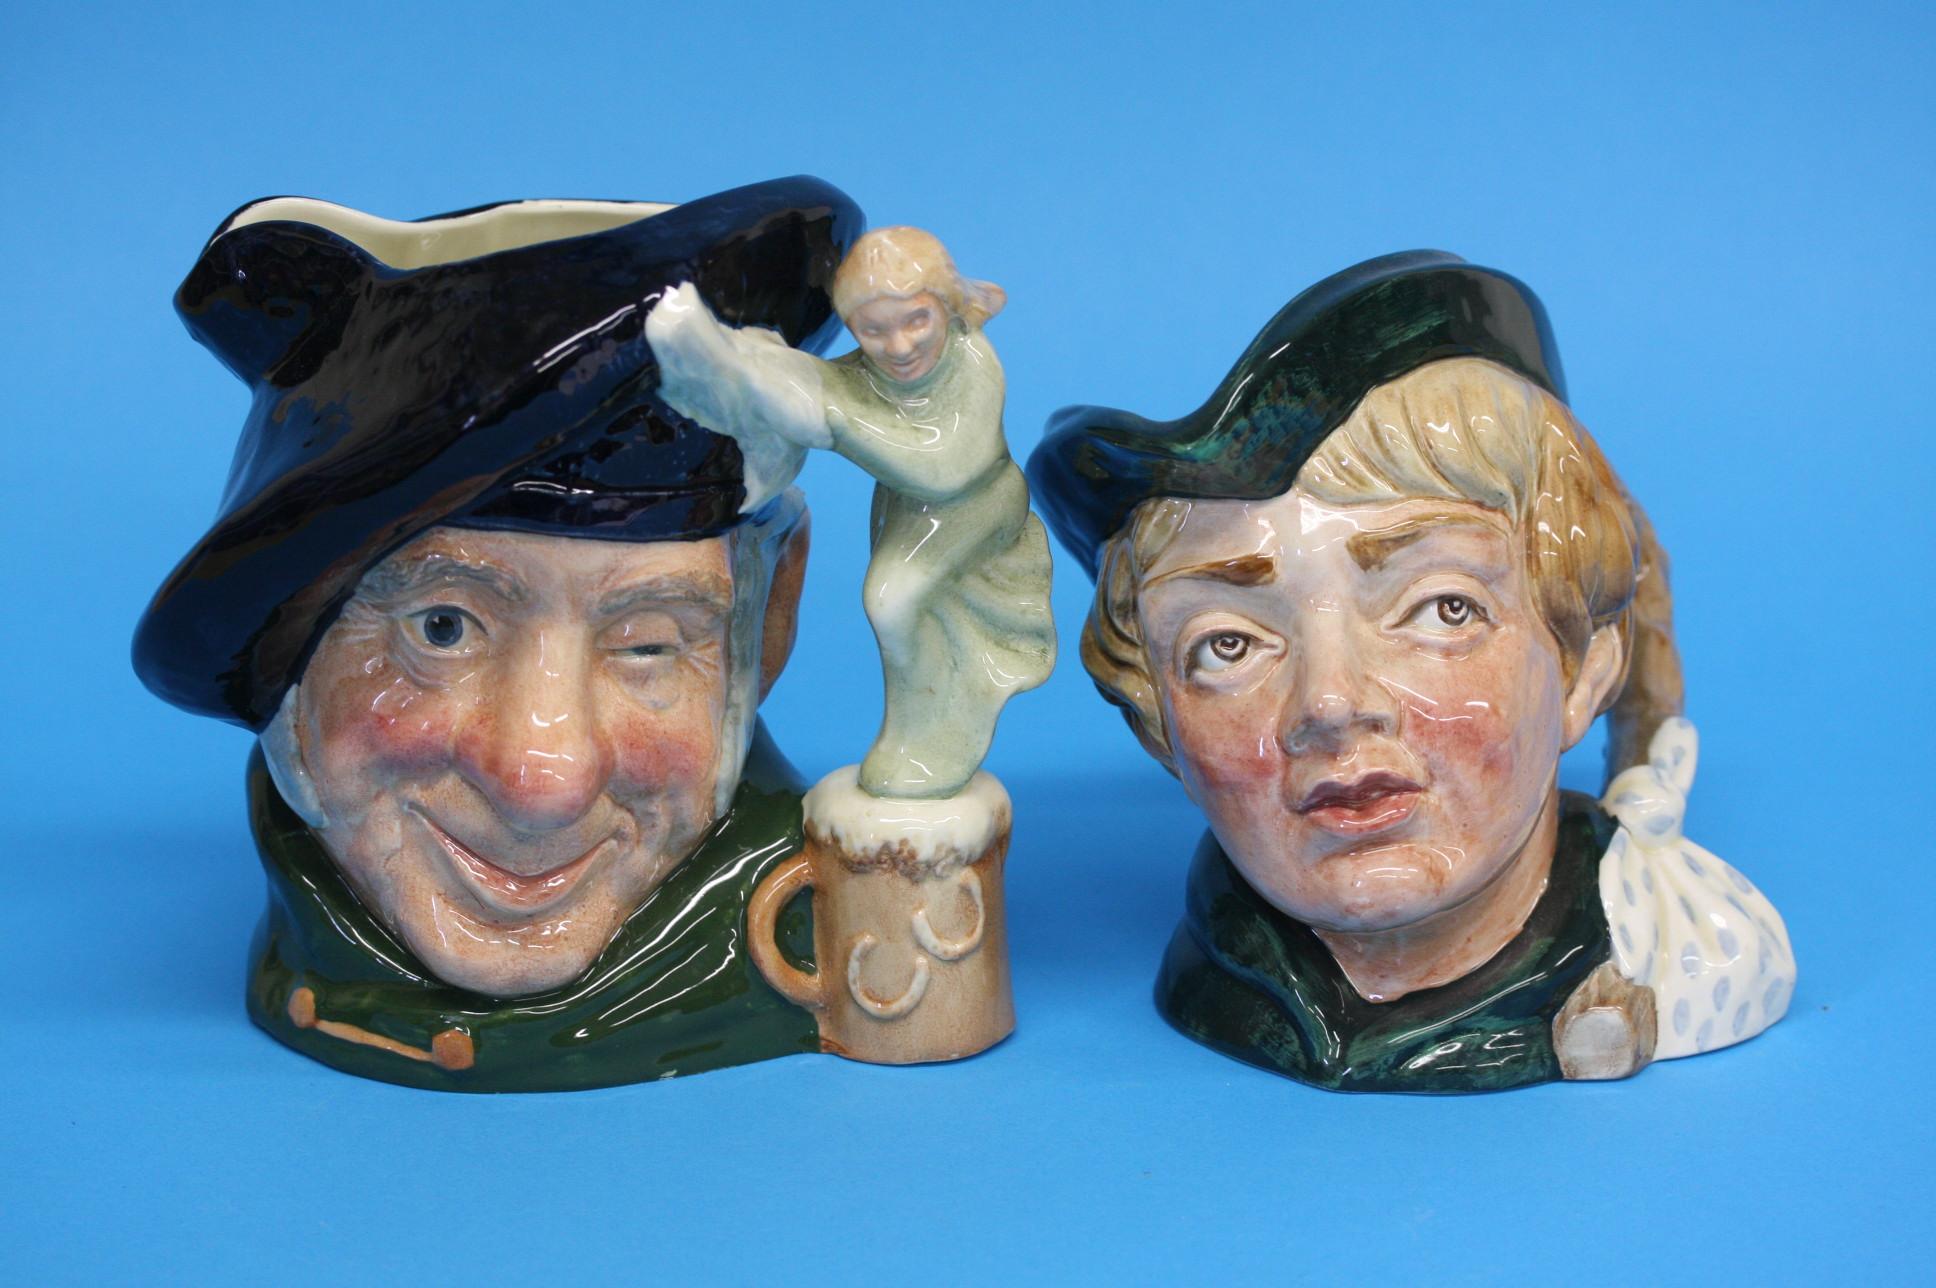 A Royal Doulton Character jug 'Dick Whittington' a